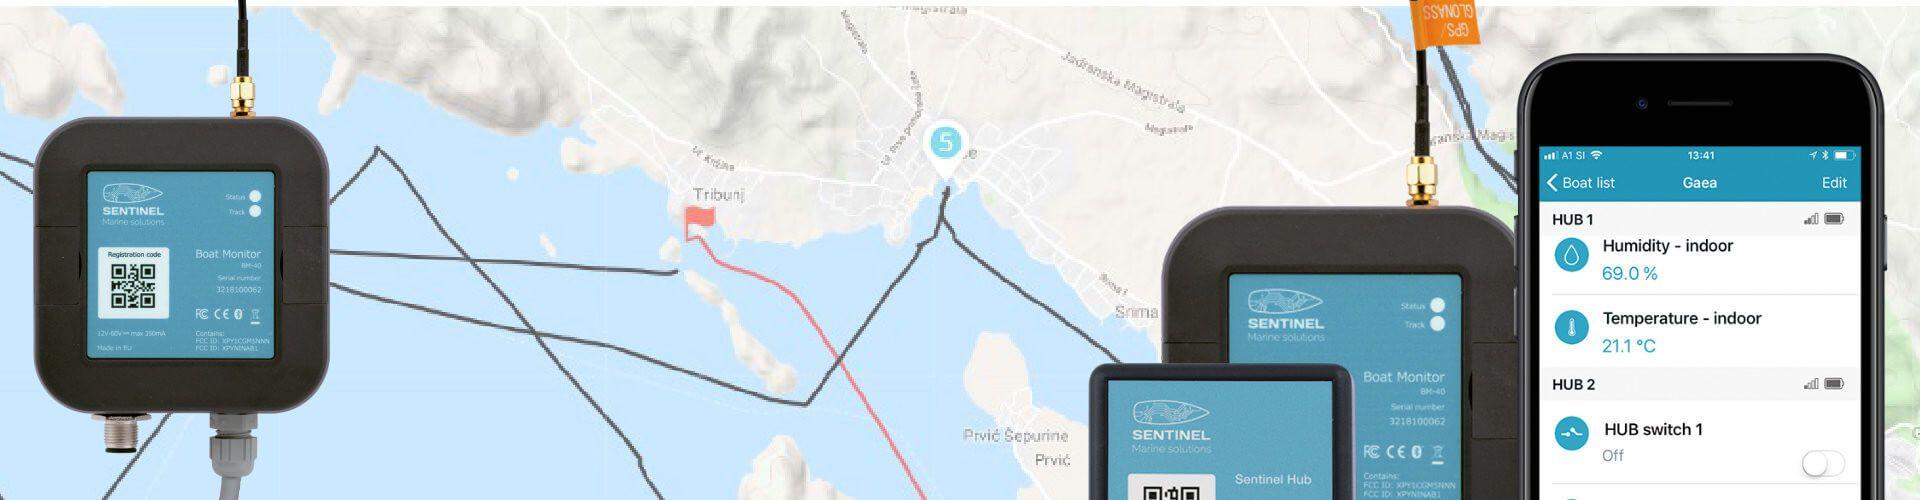 enavigare Monitorowanie jachtu